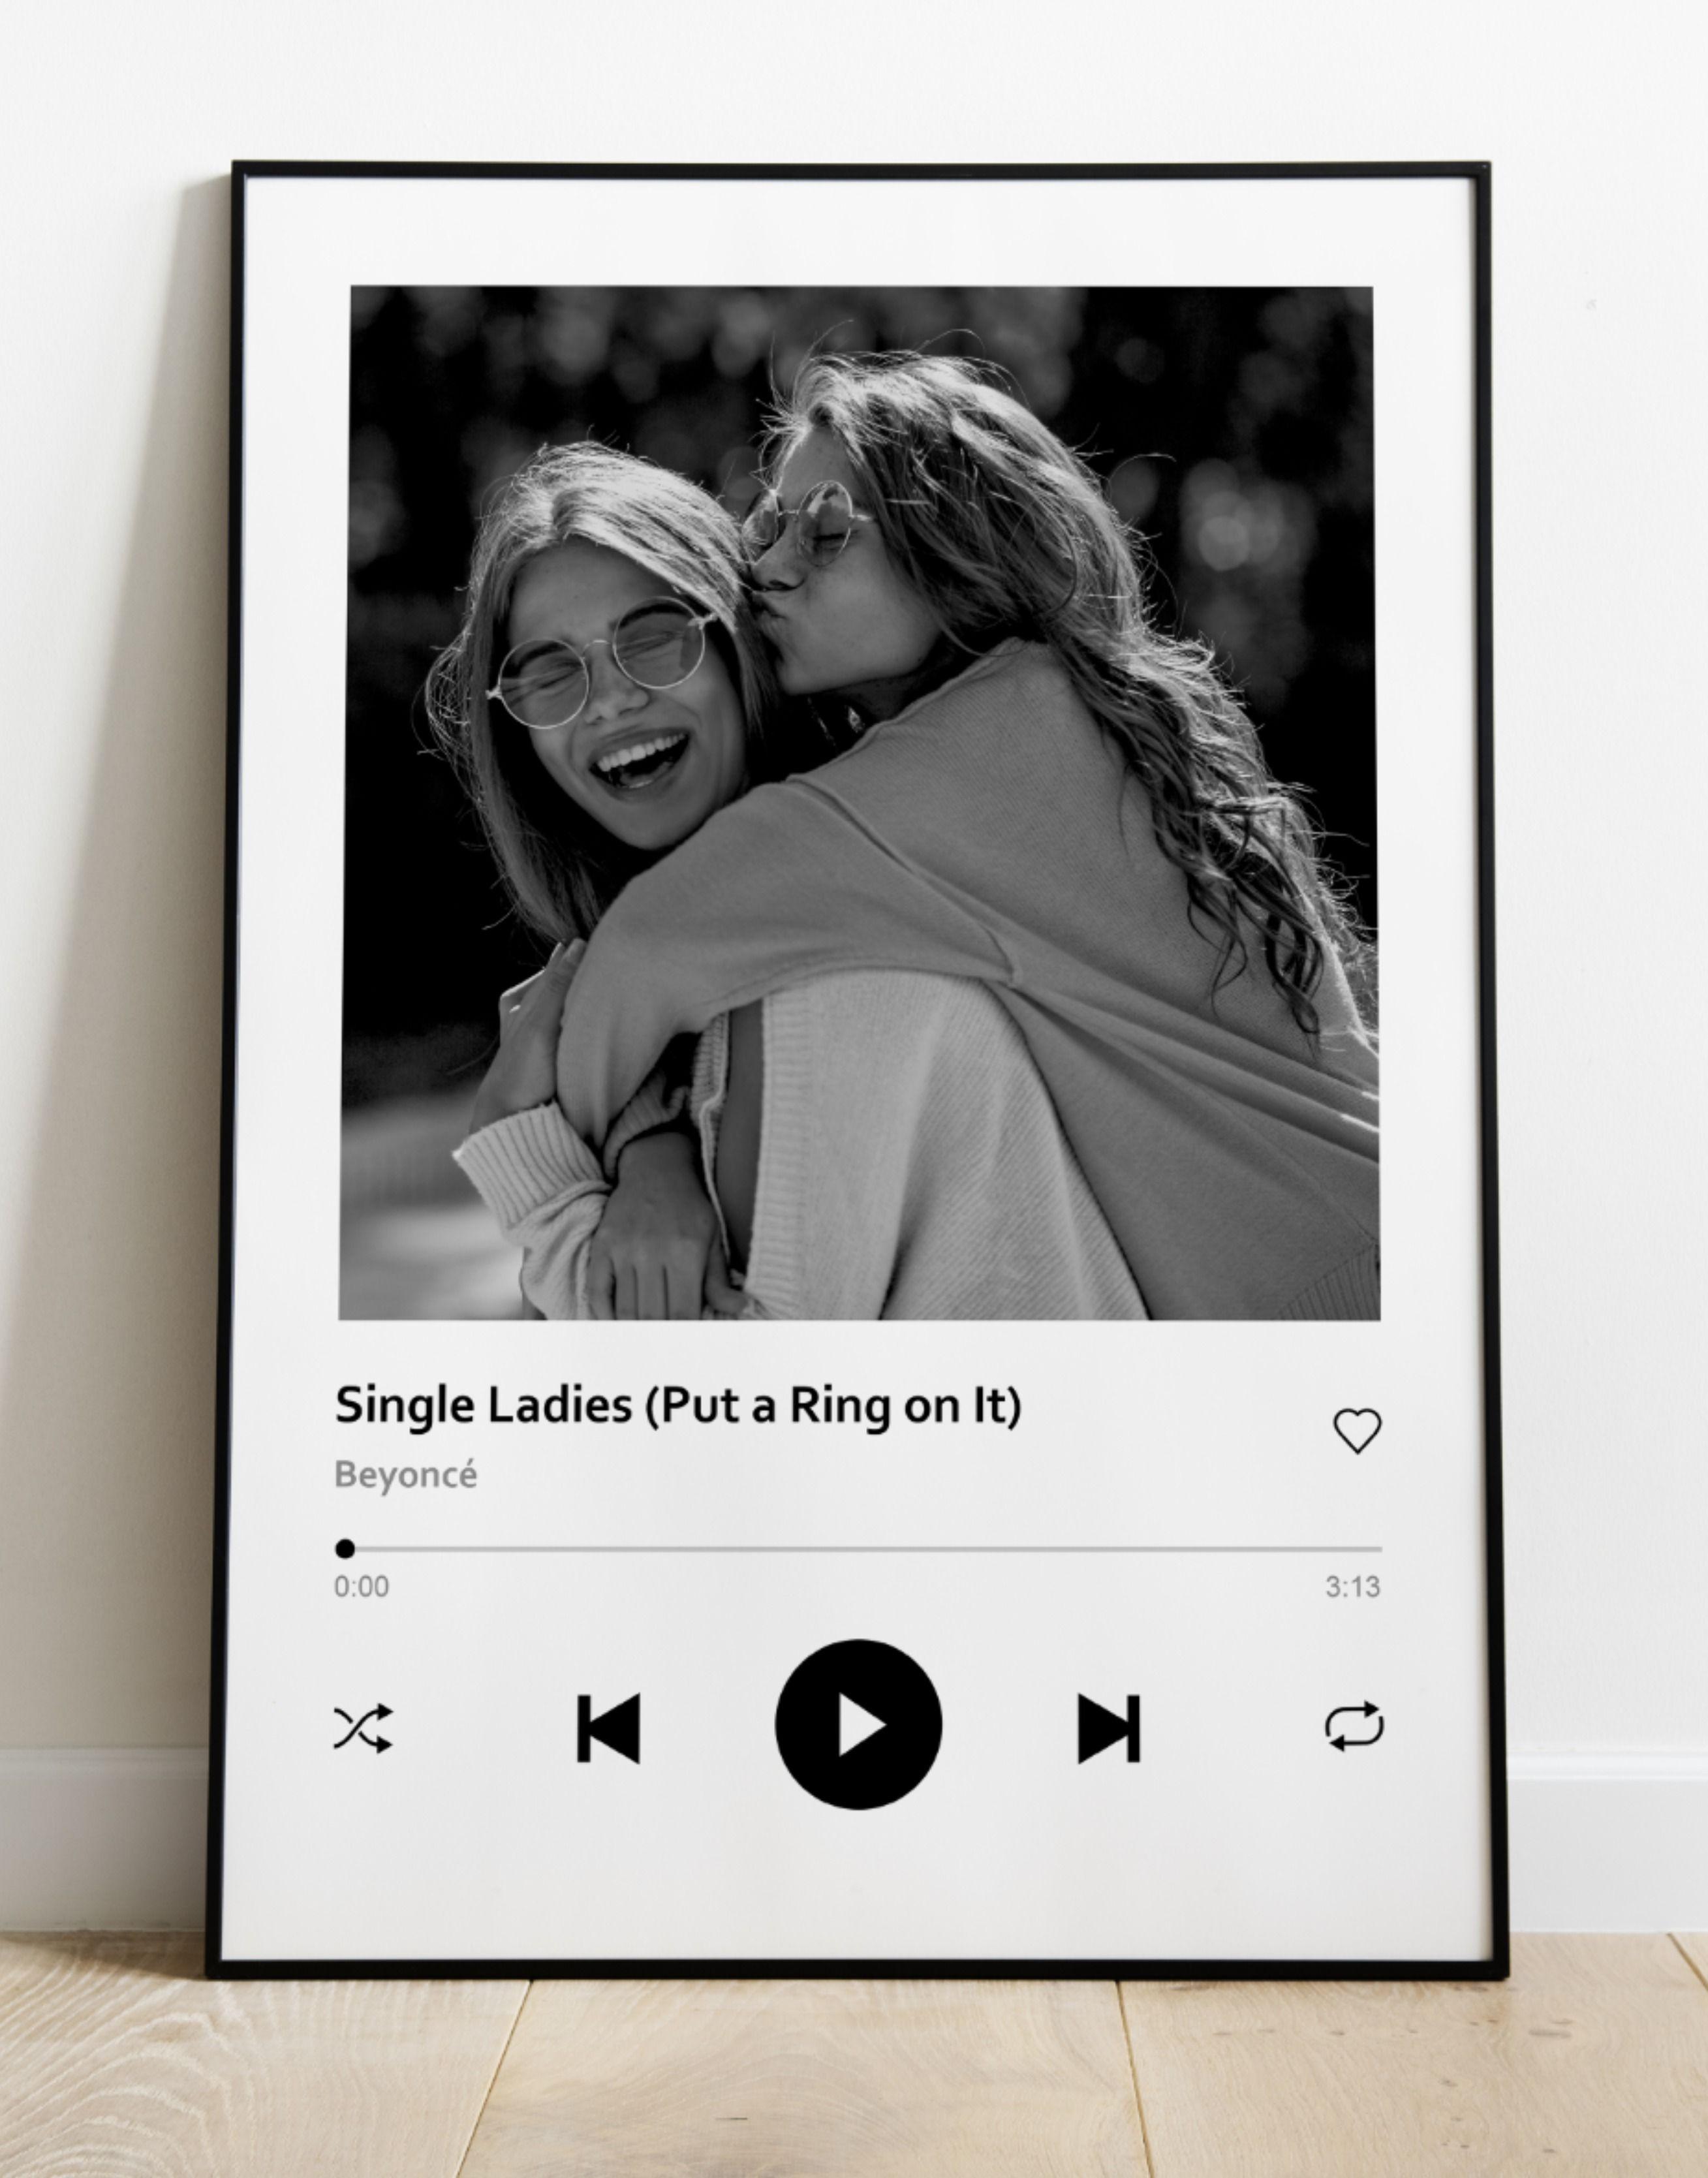 [Download 23+] Spotify Bild Geschenk Beste Freundin